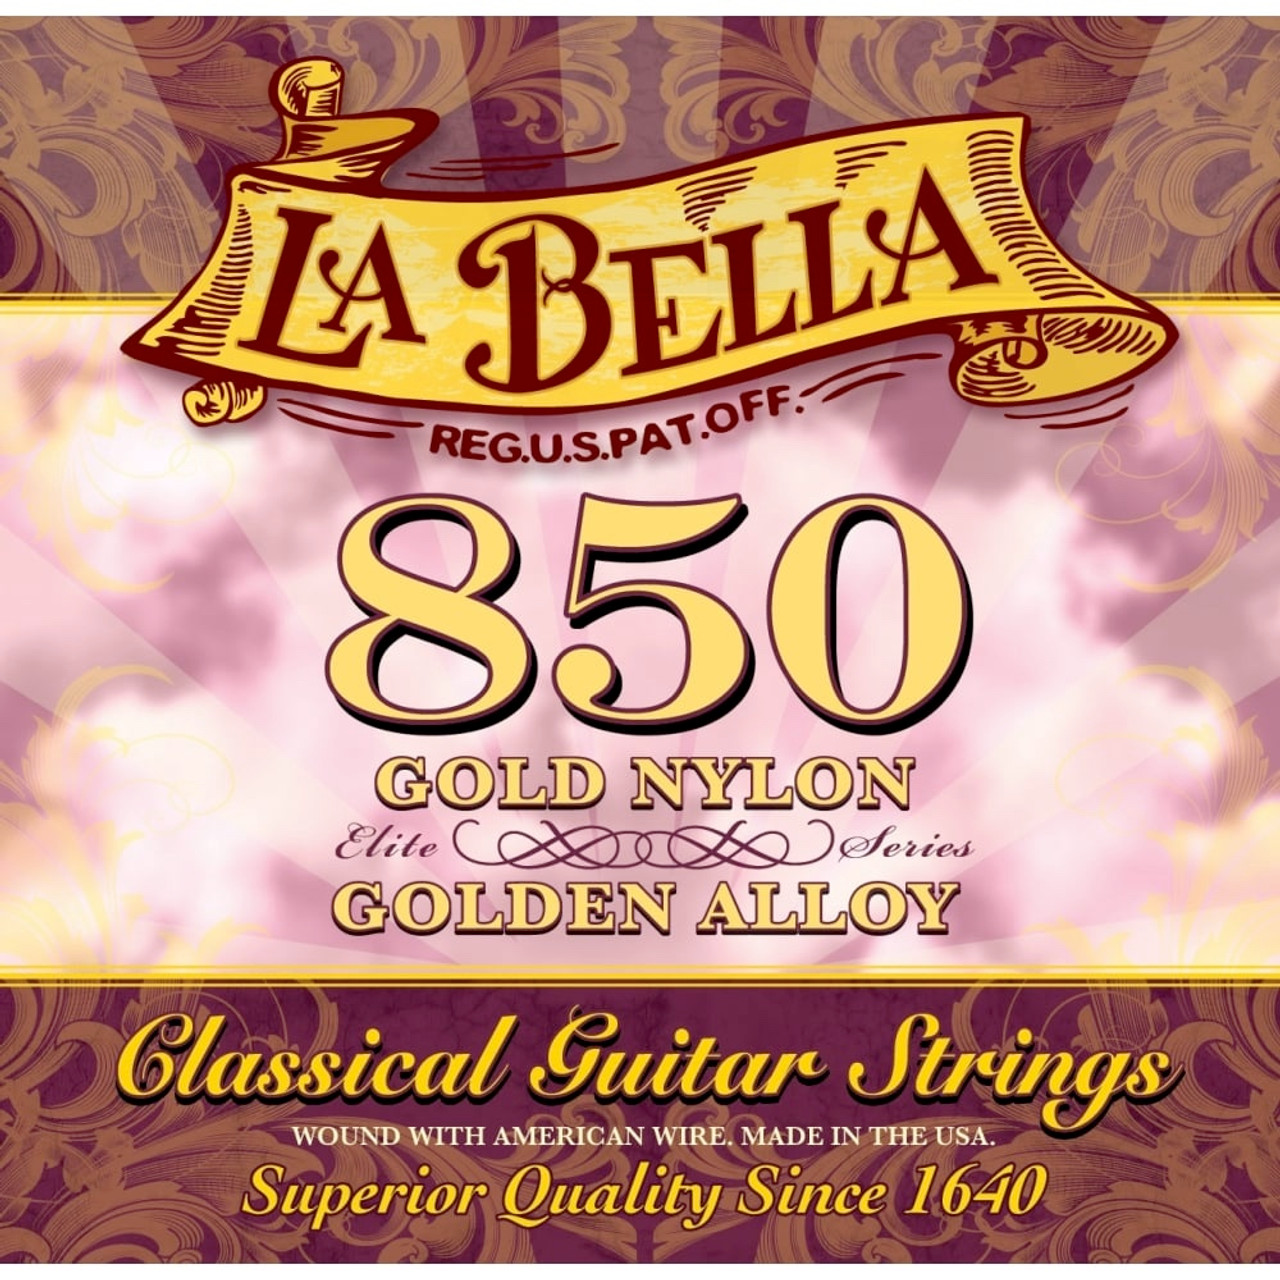 La Bella Elite Classical Guitar Strings Ireland